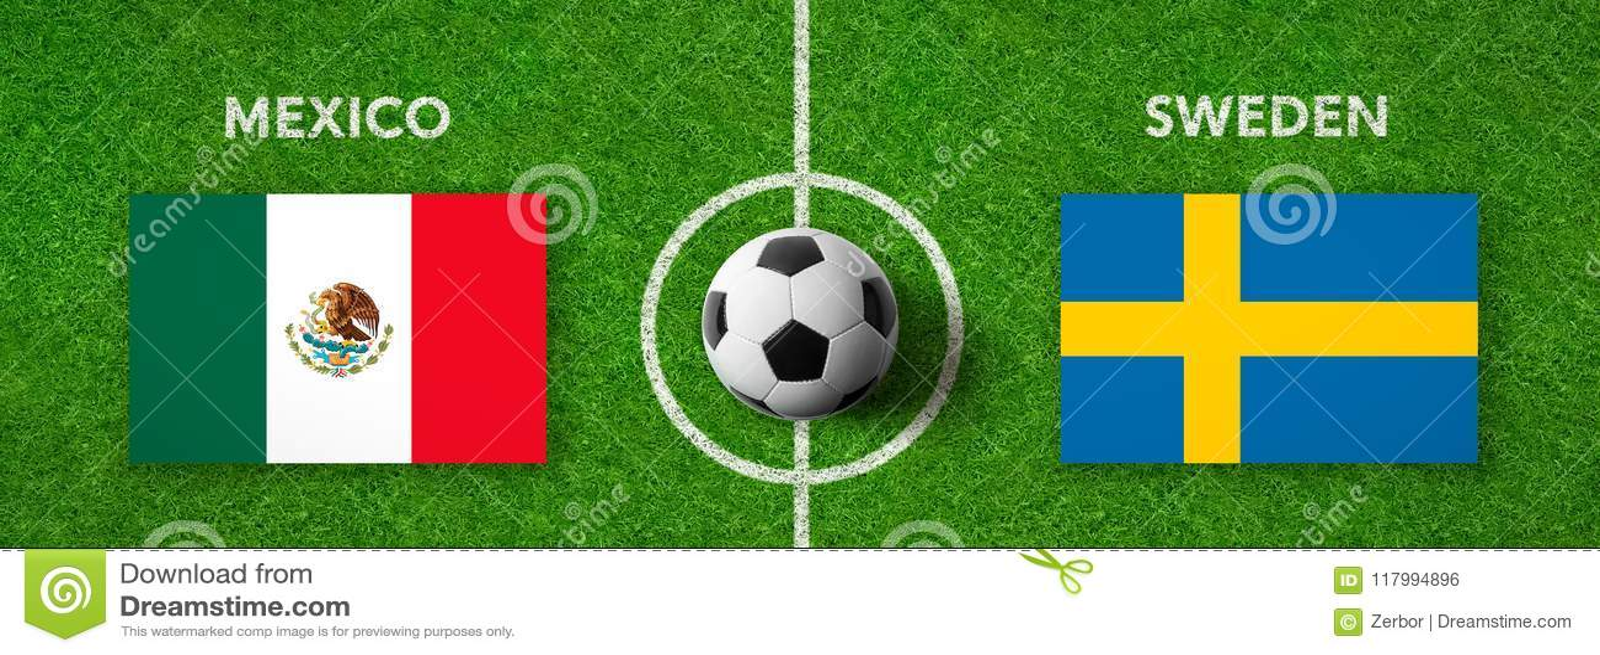 Fotbollsmatch Mexico vs sweden